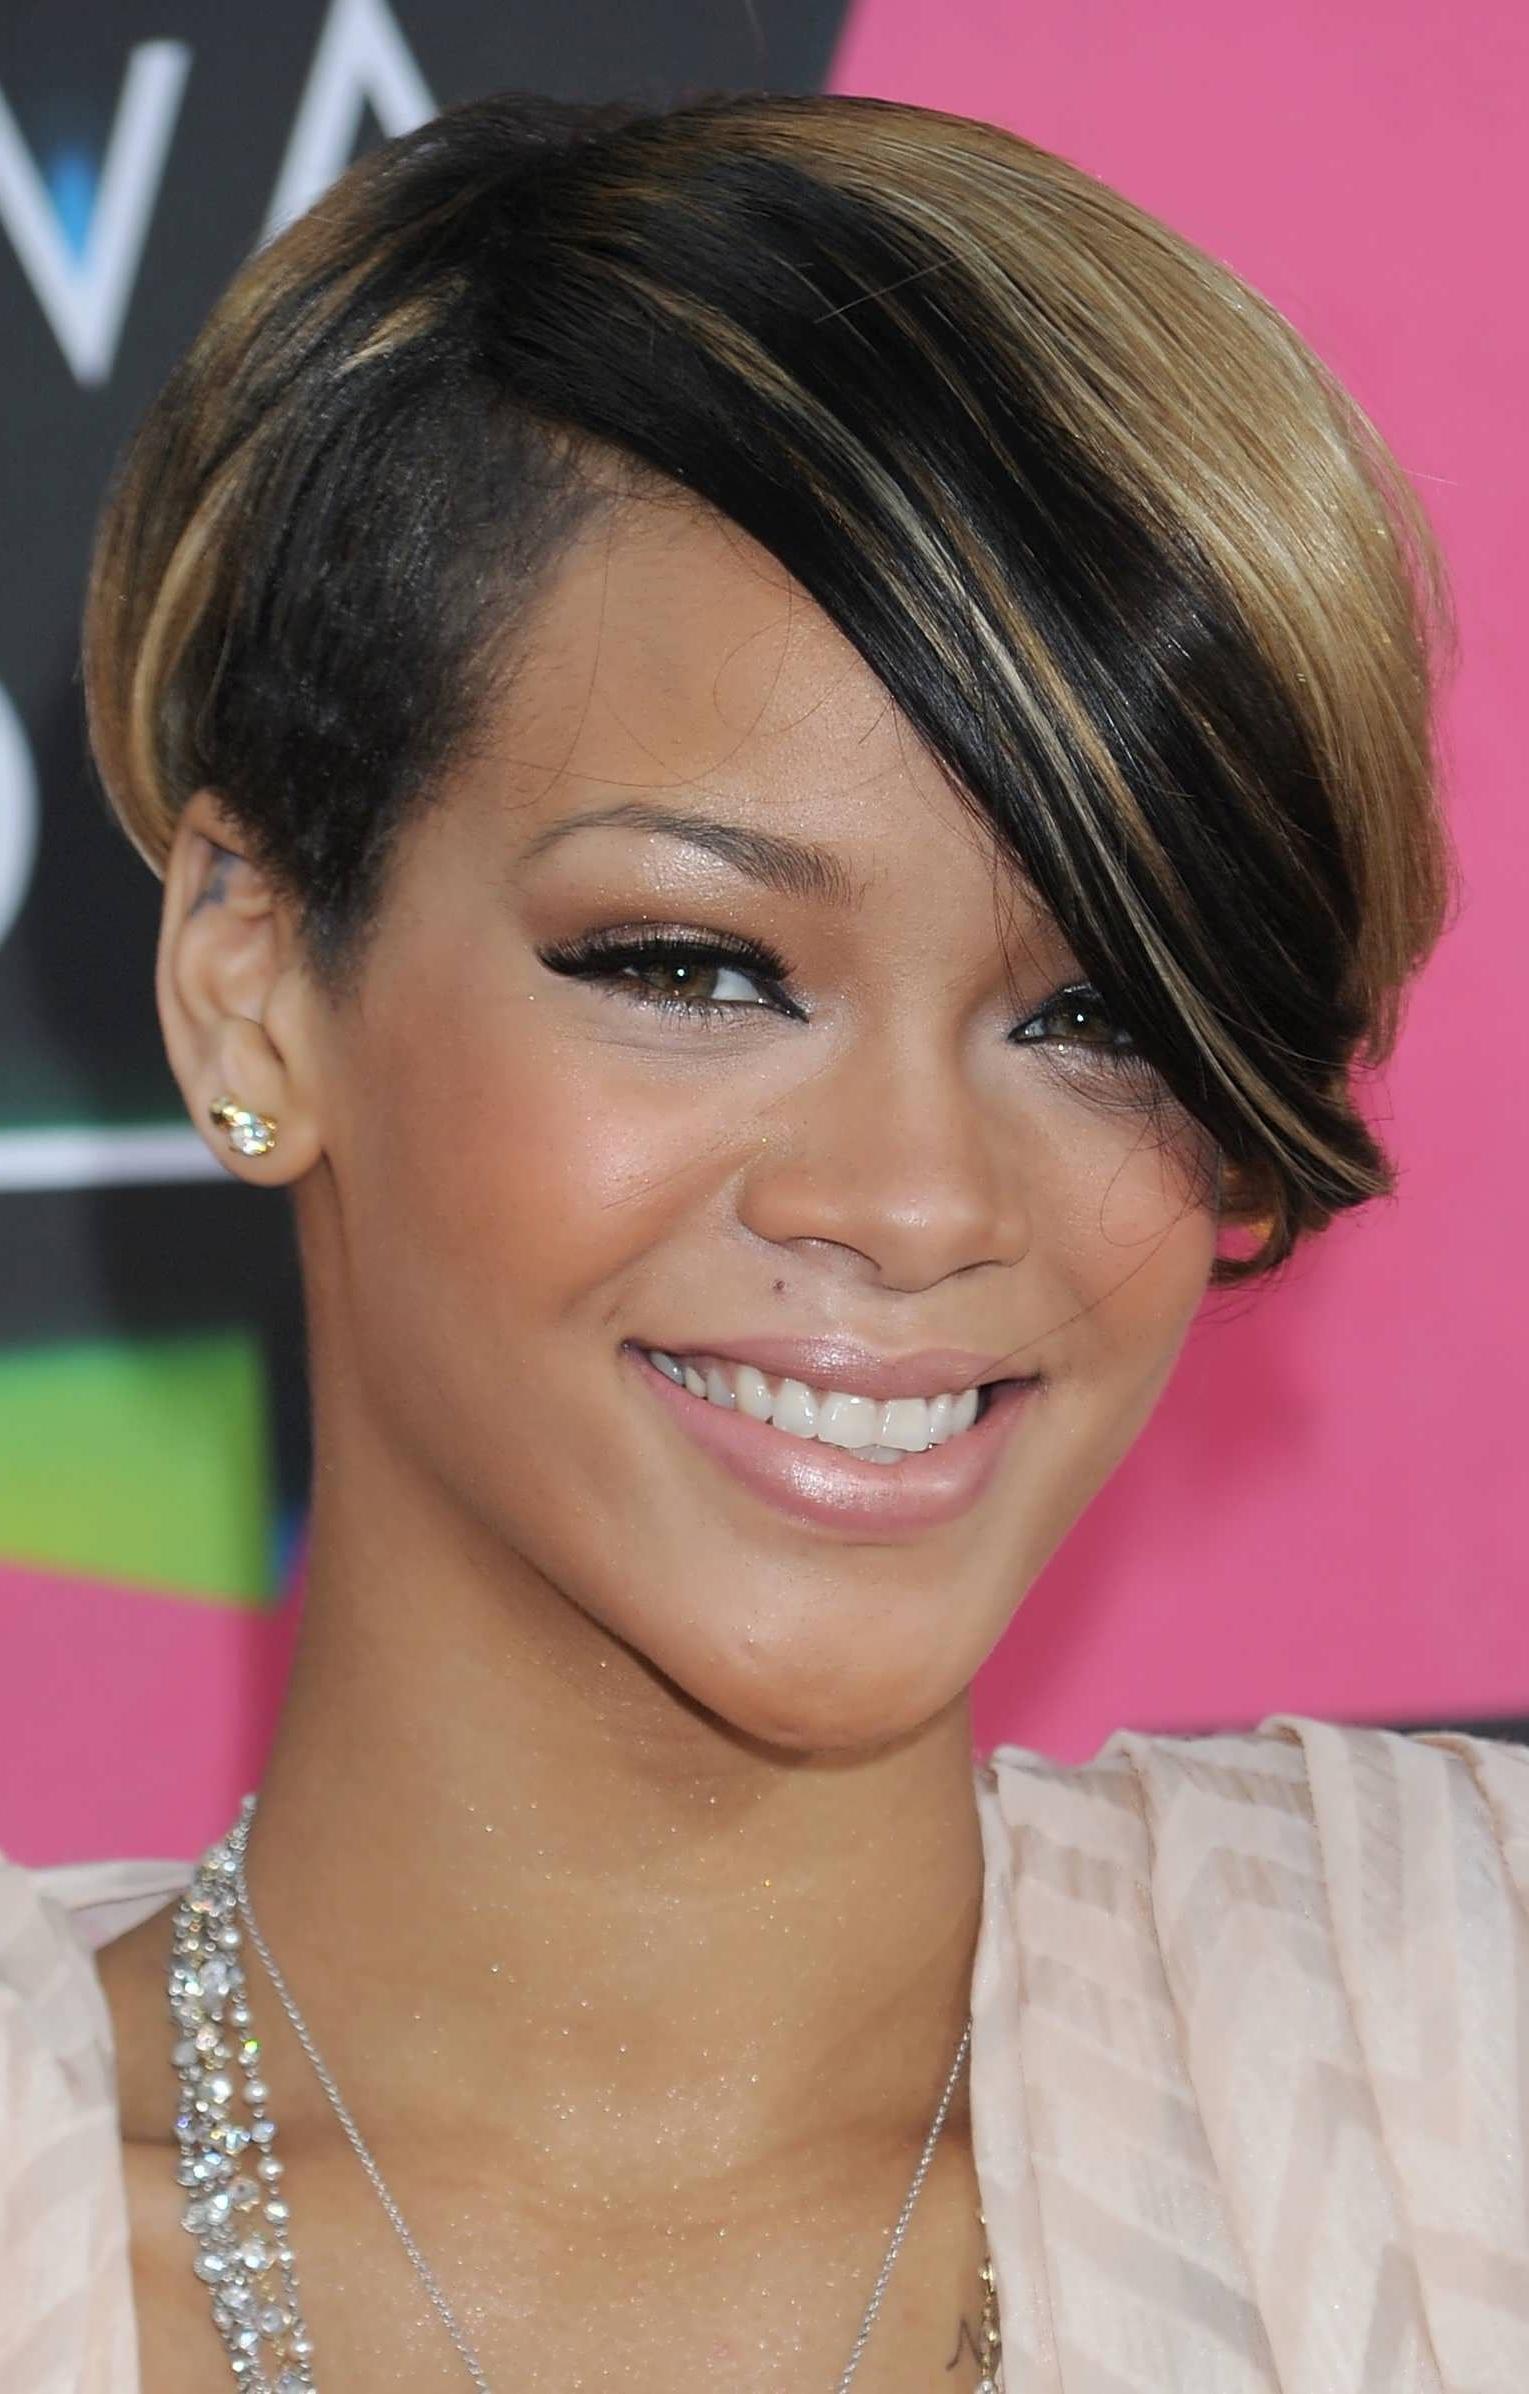 Pinbestenfrisurcom On Besten Frisur   Pinterest   Short Layered In Short Hairstyles For Round Faces African American (View 5 of 25)